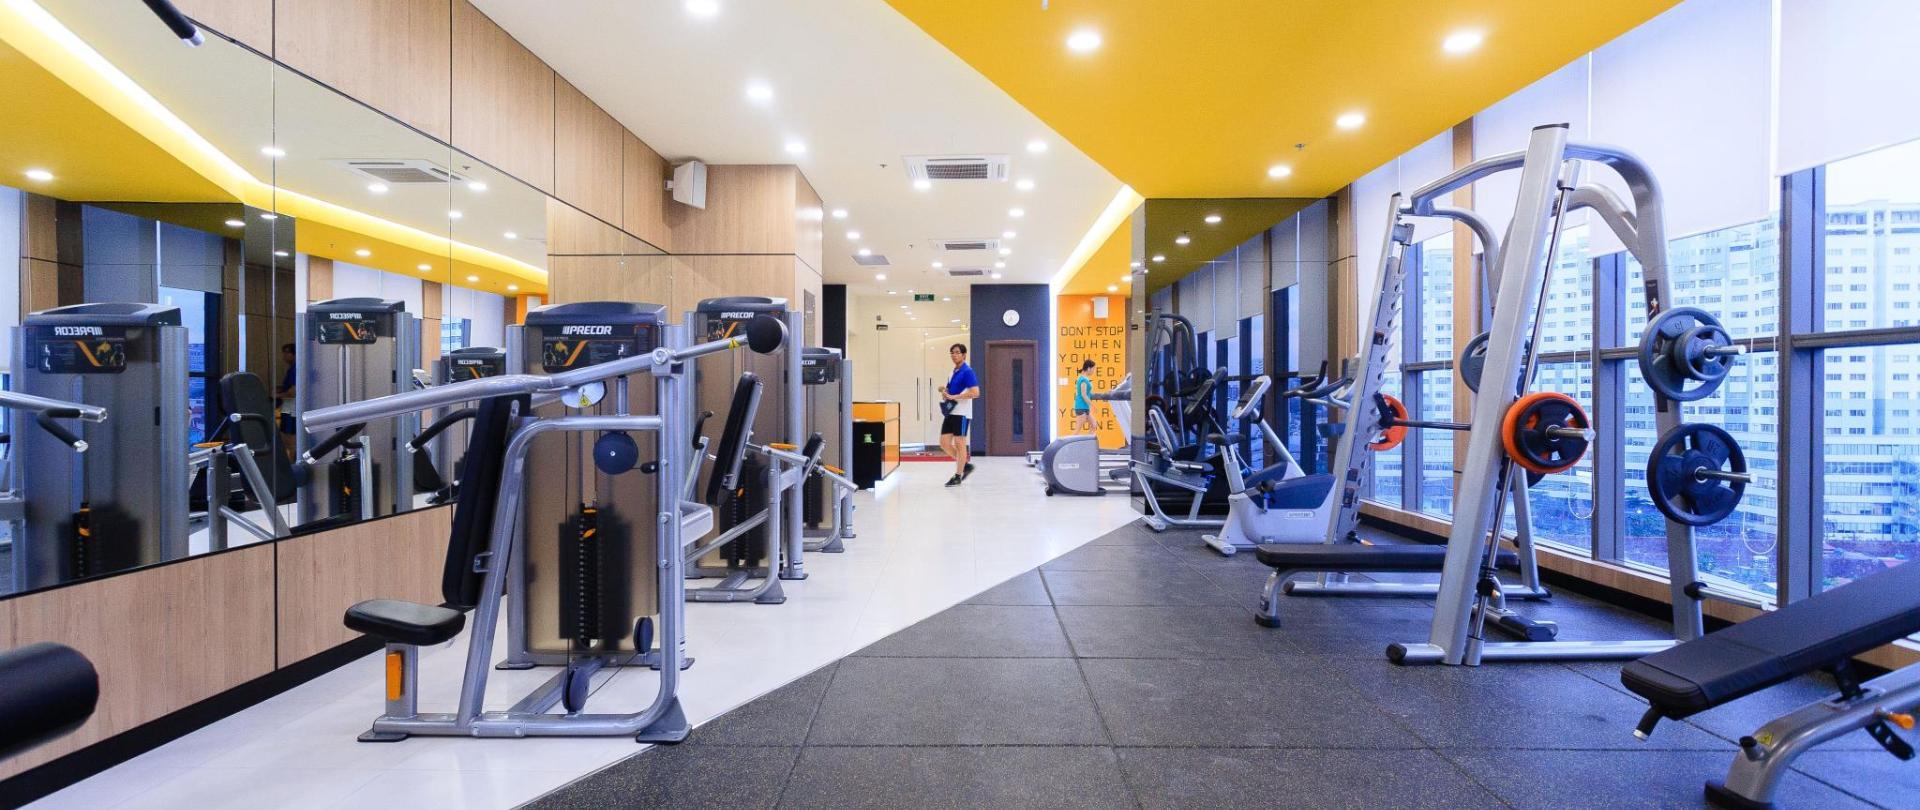 trip-apartment-saigon-lobby-gym-1.jpg